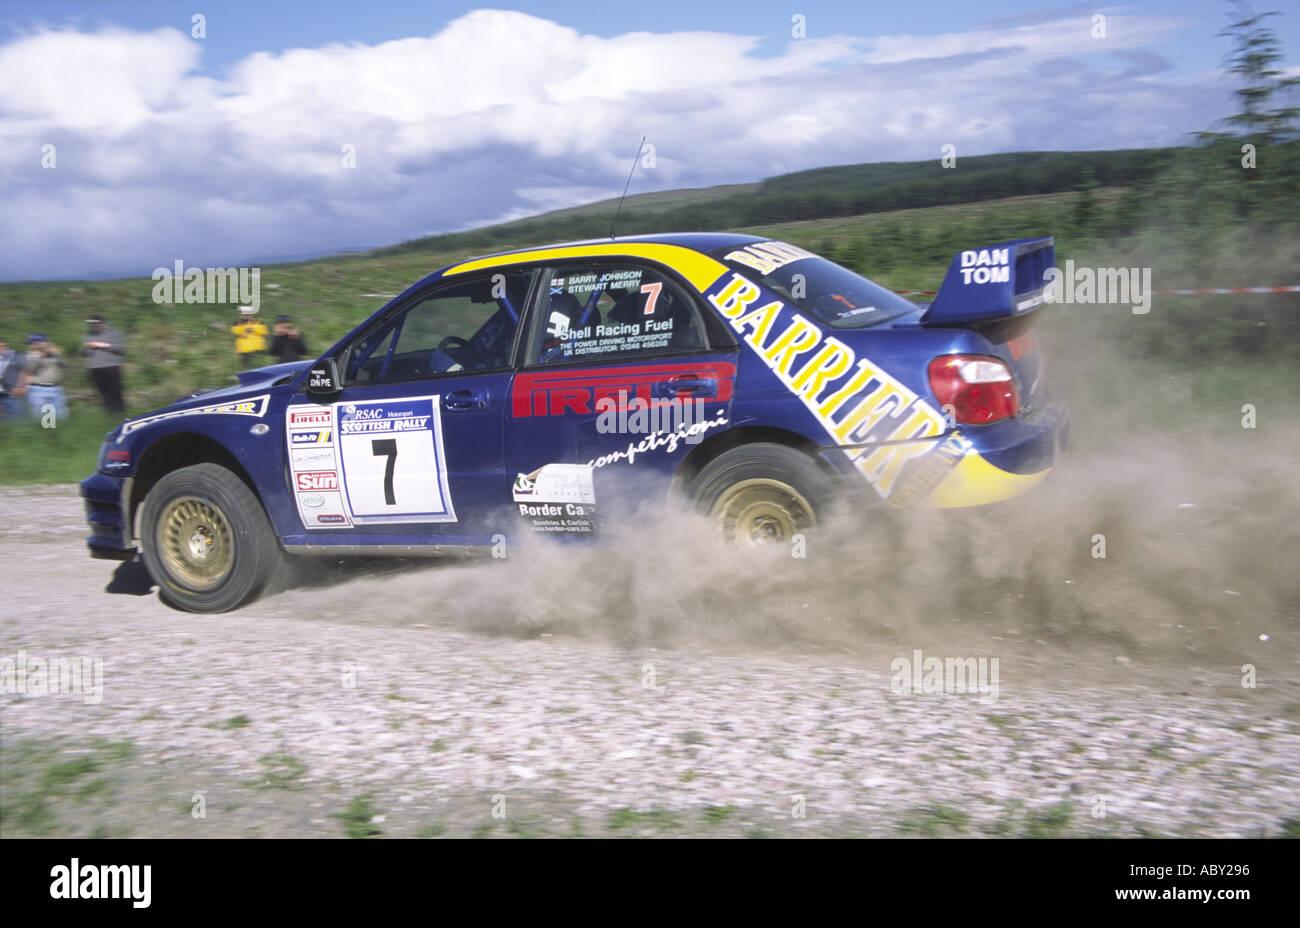 RSAC Scottish Rally cornering rally car kicking up the dust - Stock Image